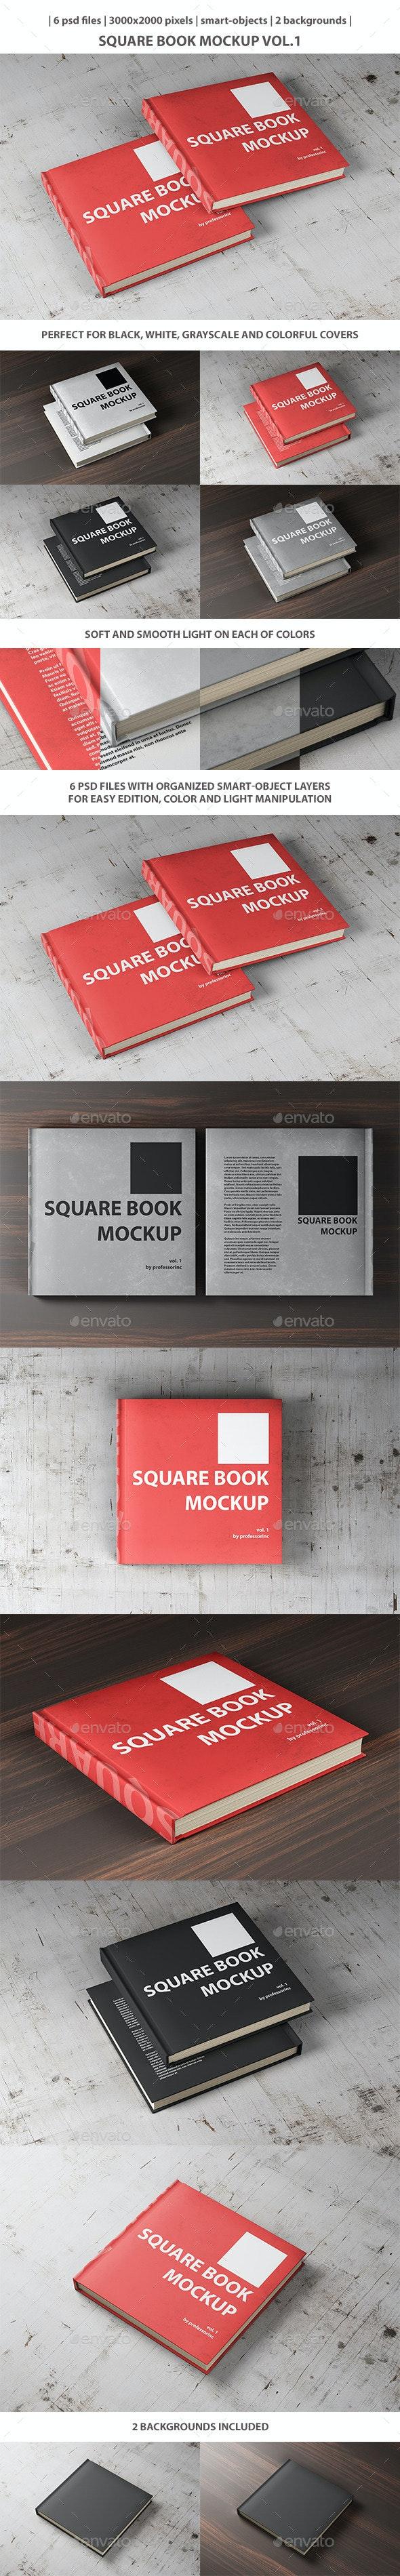 Square Book Mockup Vol. 1 - Books Print